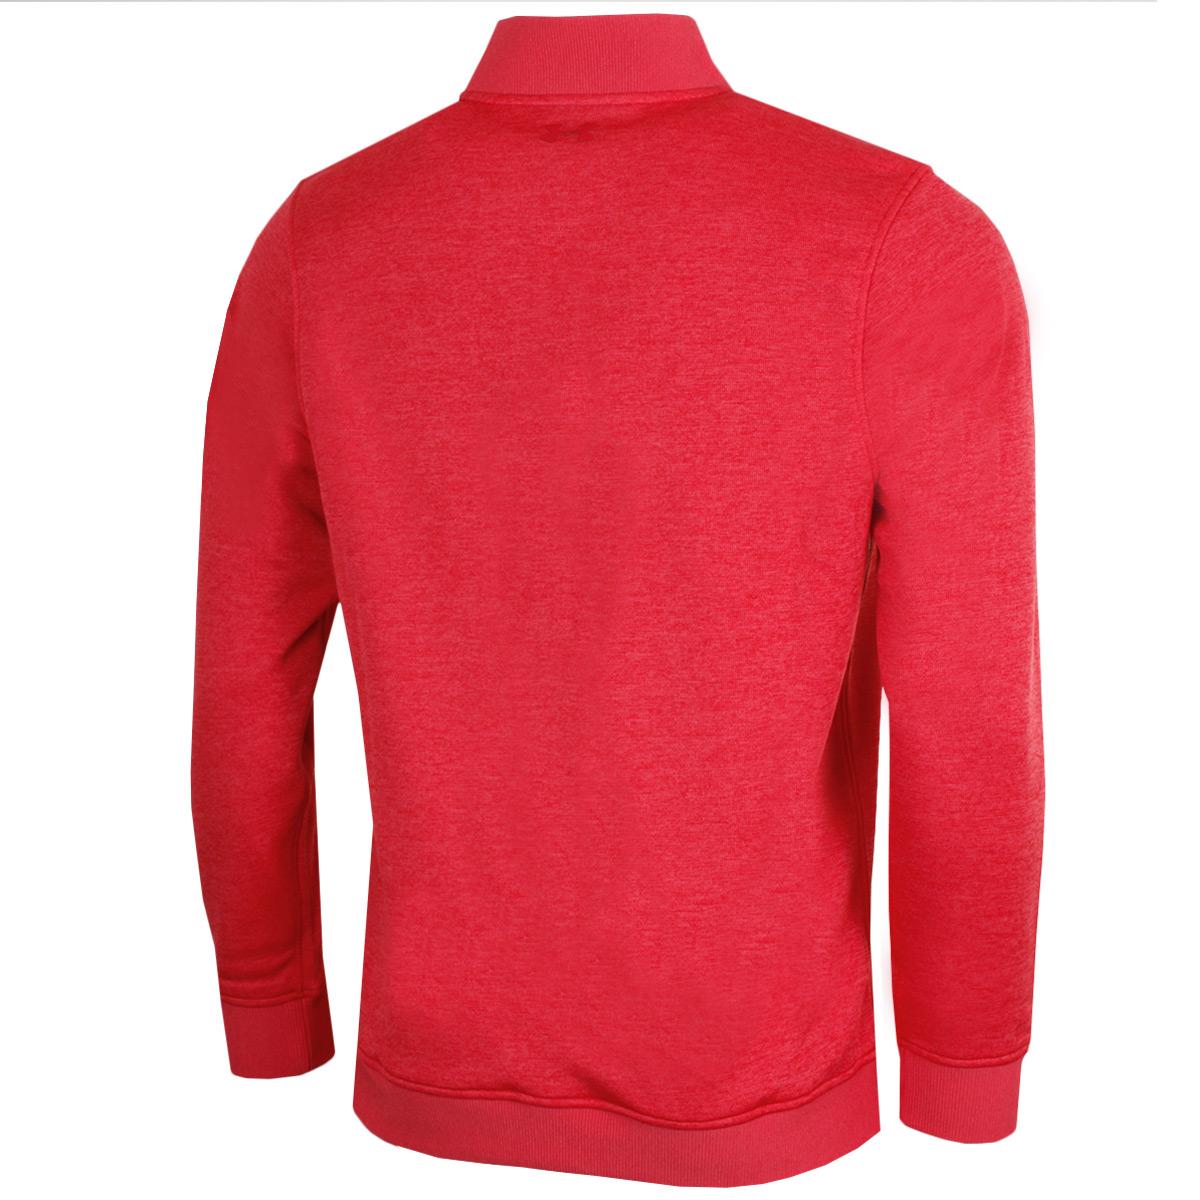 Under-Armour-Mens-UA-Storm-Sweater-Fleece-1-4-Zip-Pullover-Jumper-25-OFF-RRP thumbnail 26